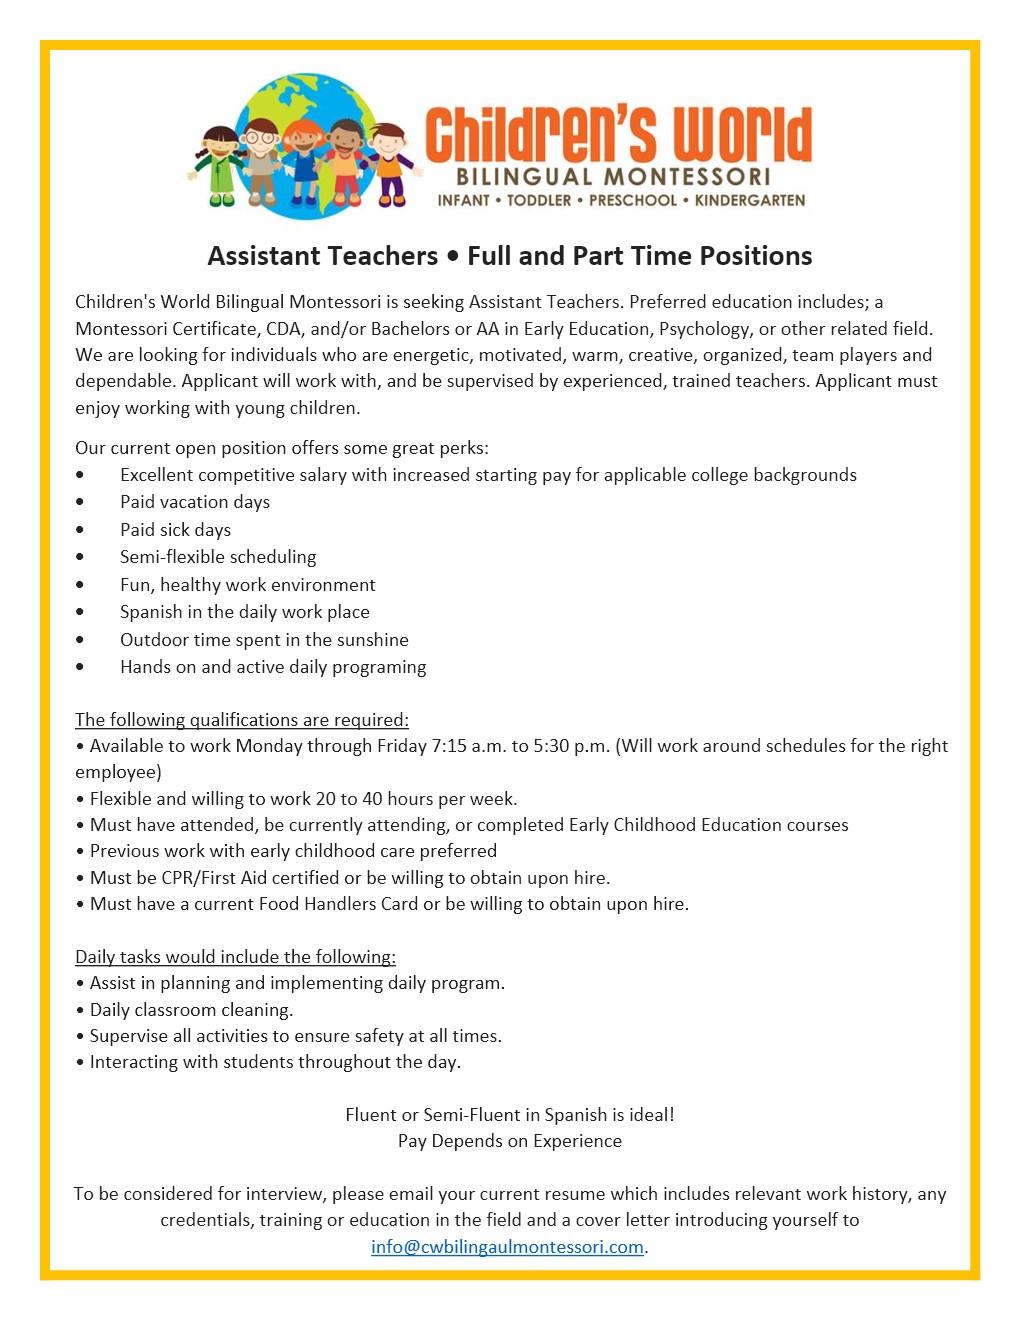 Employment Childrens World Bilingual Montessori